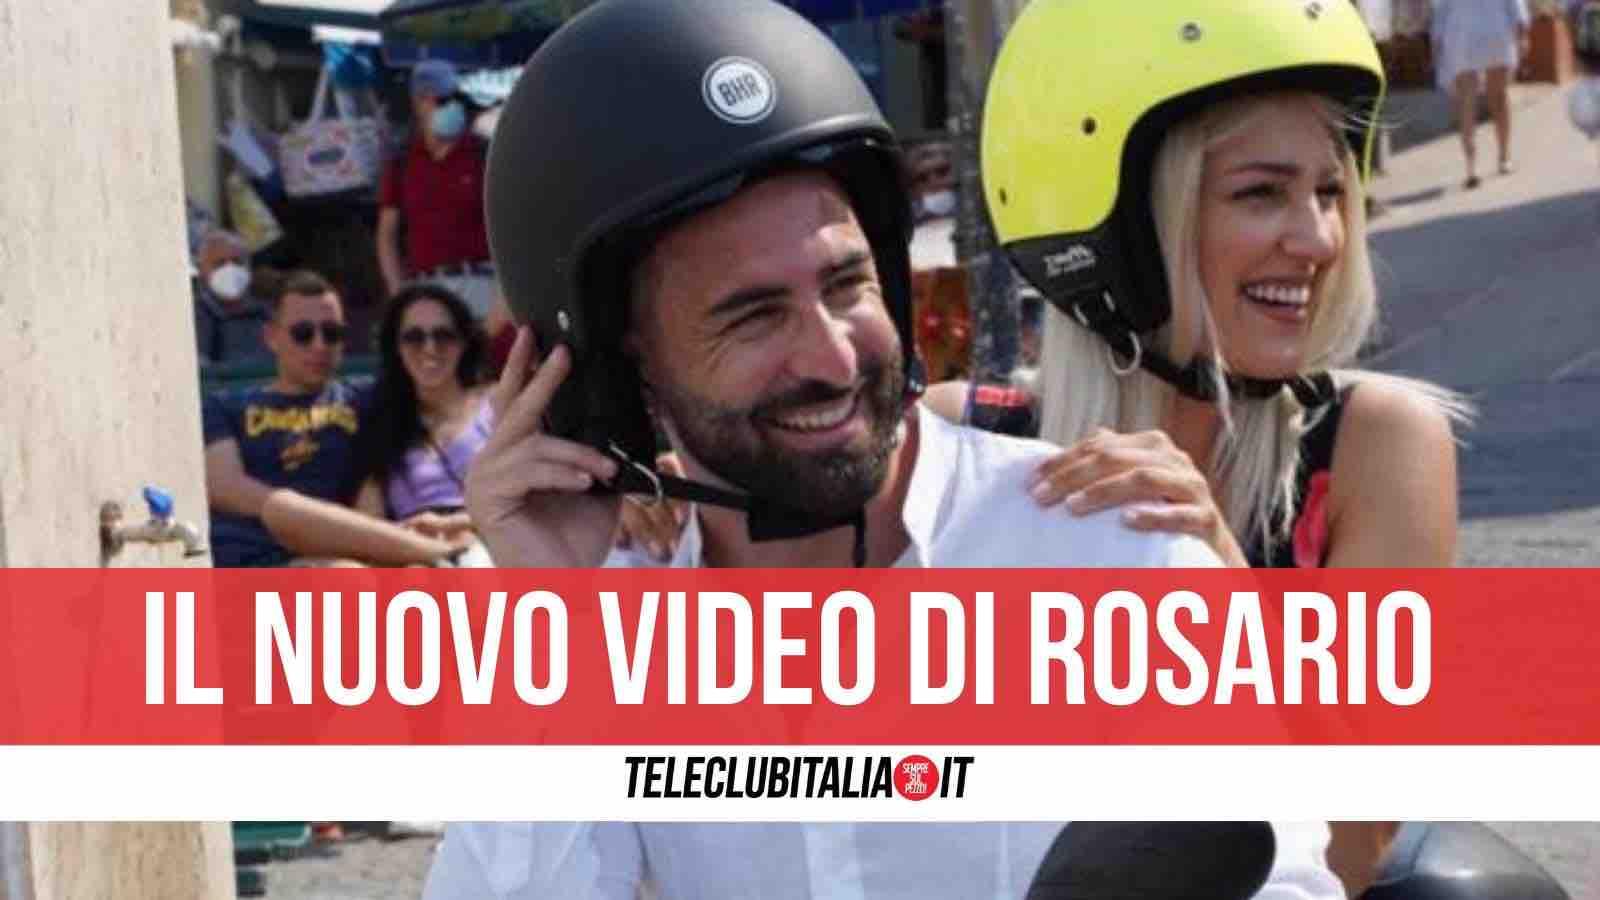 rosario miraggio video